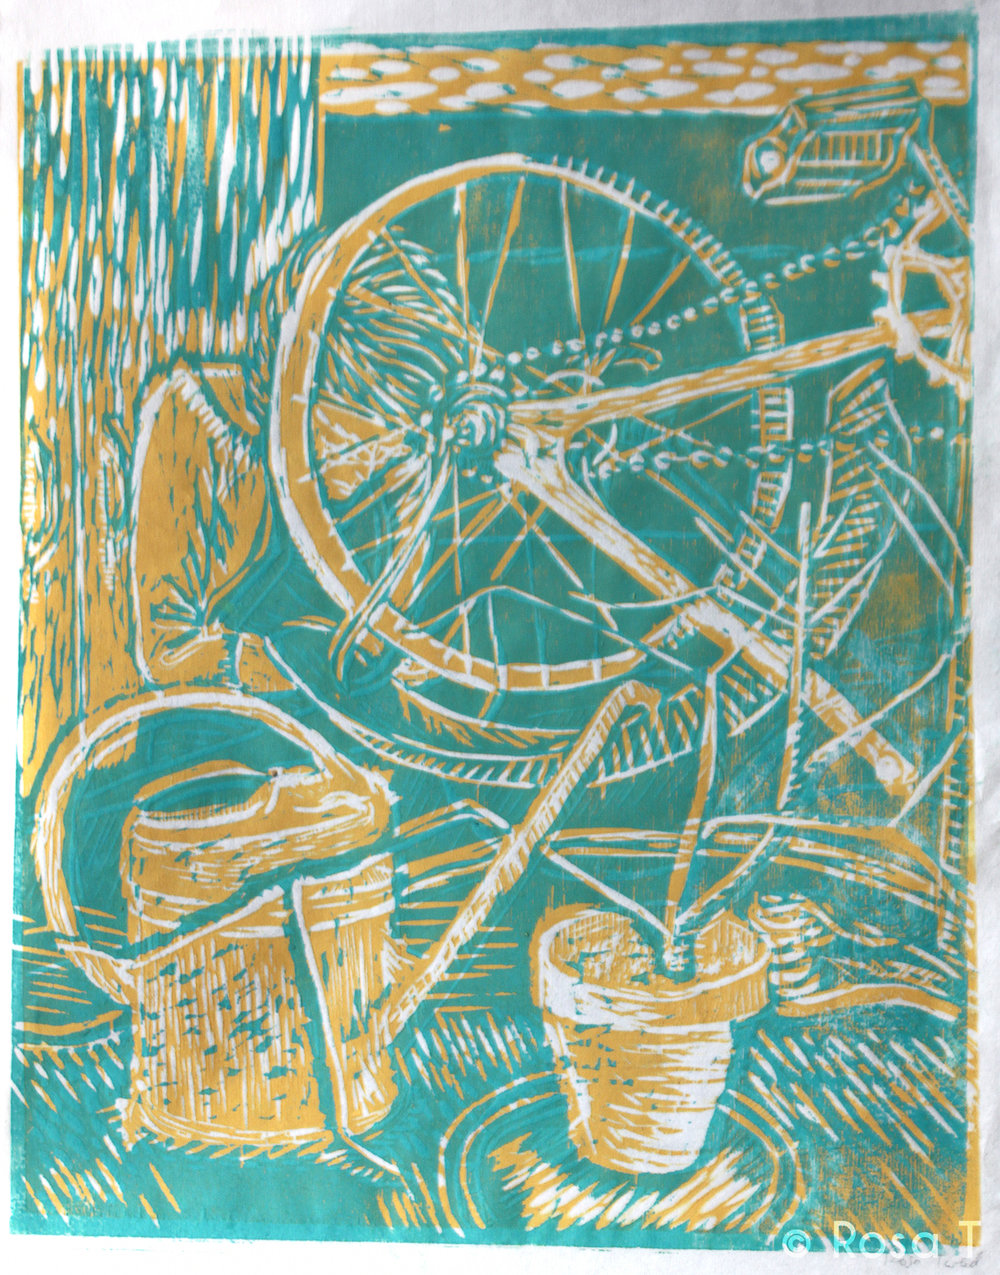 In the Bike Shop (2015)